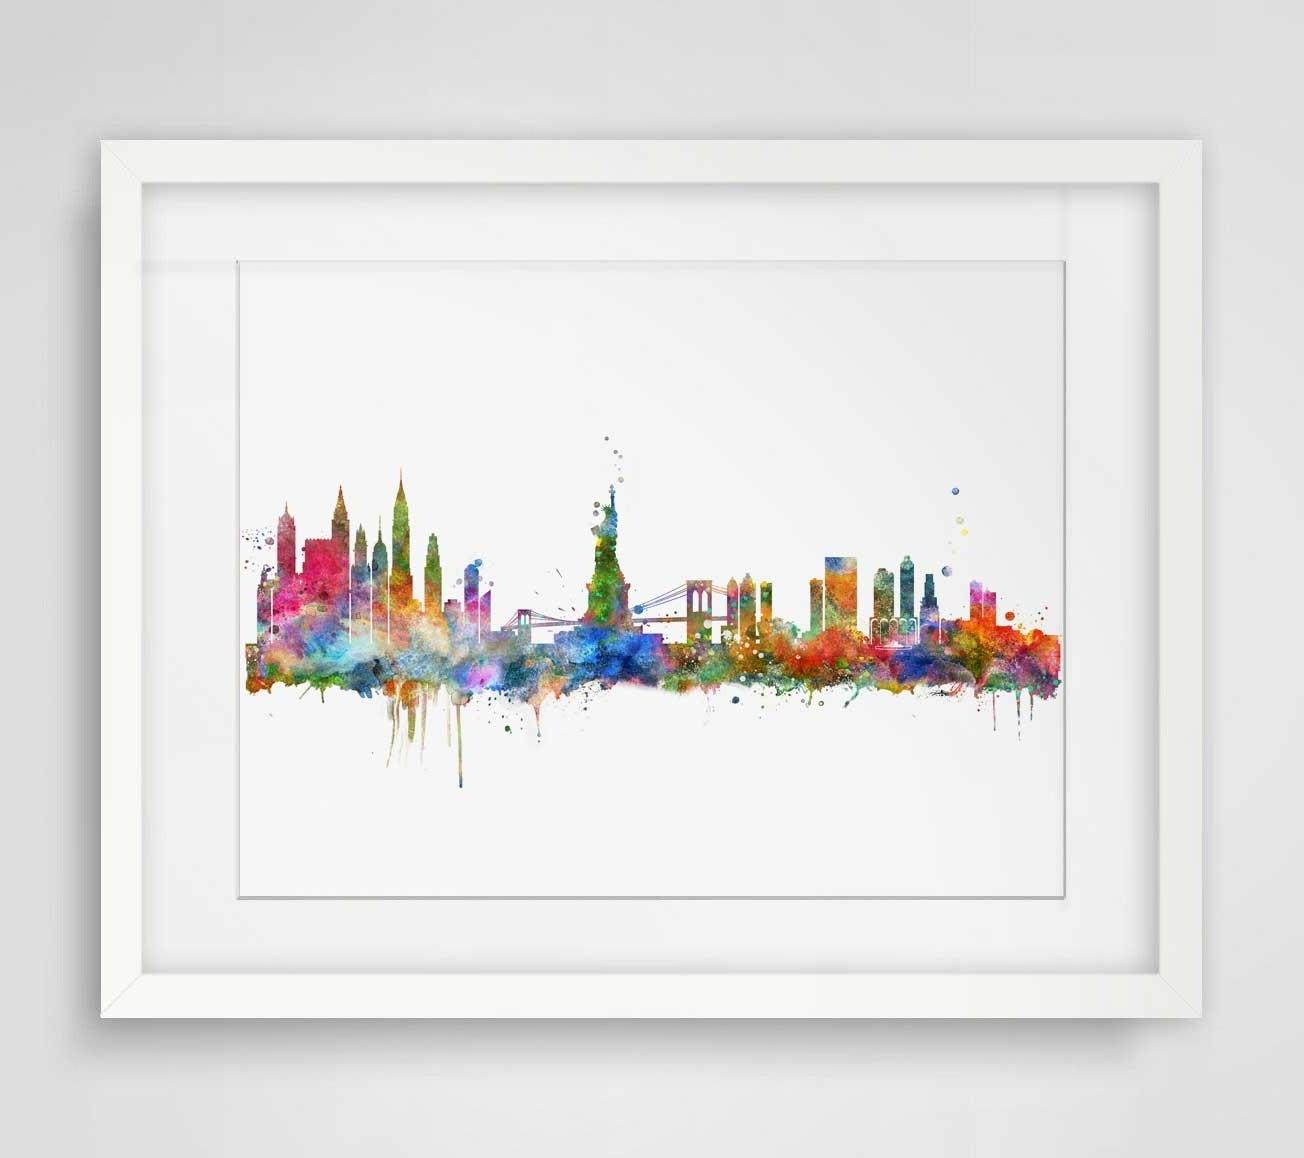 New York City Skyline Watercolor Poster Ny City Map Skyline Art Regarding Fashionable New York City Map Wall Art (View 9 of 15)